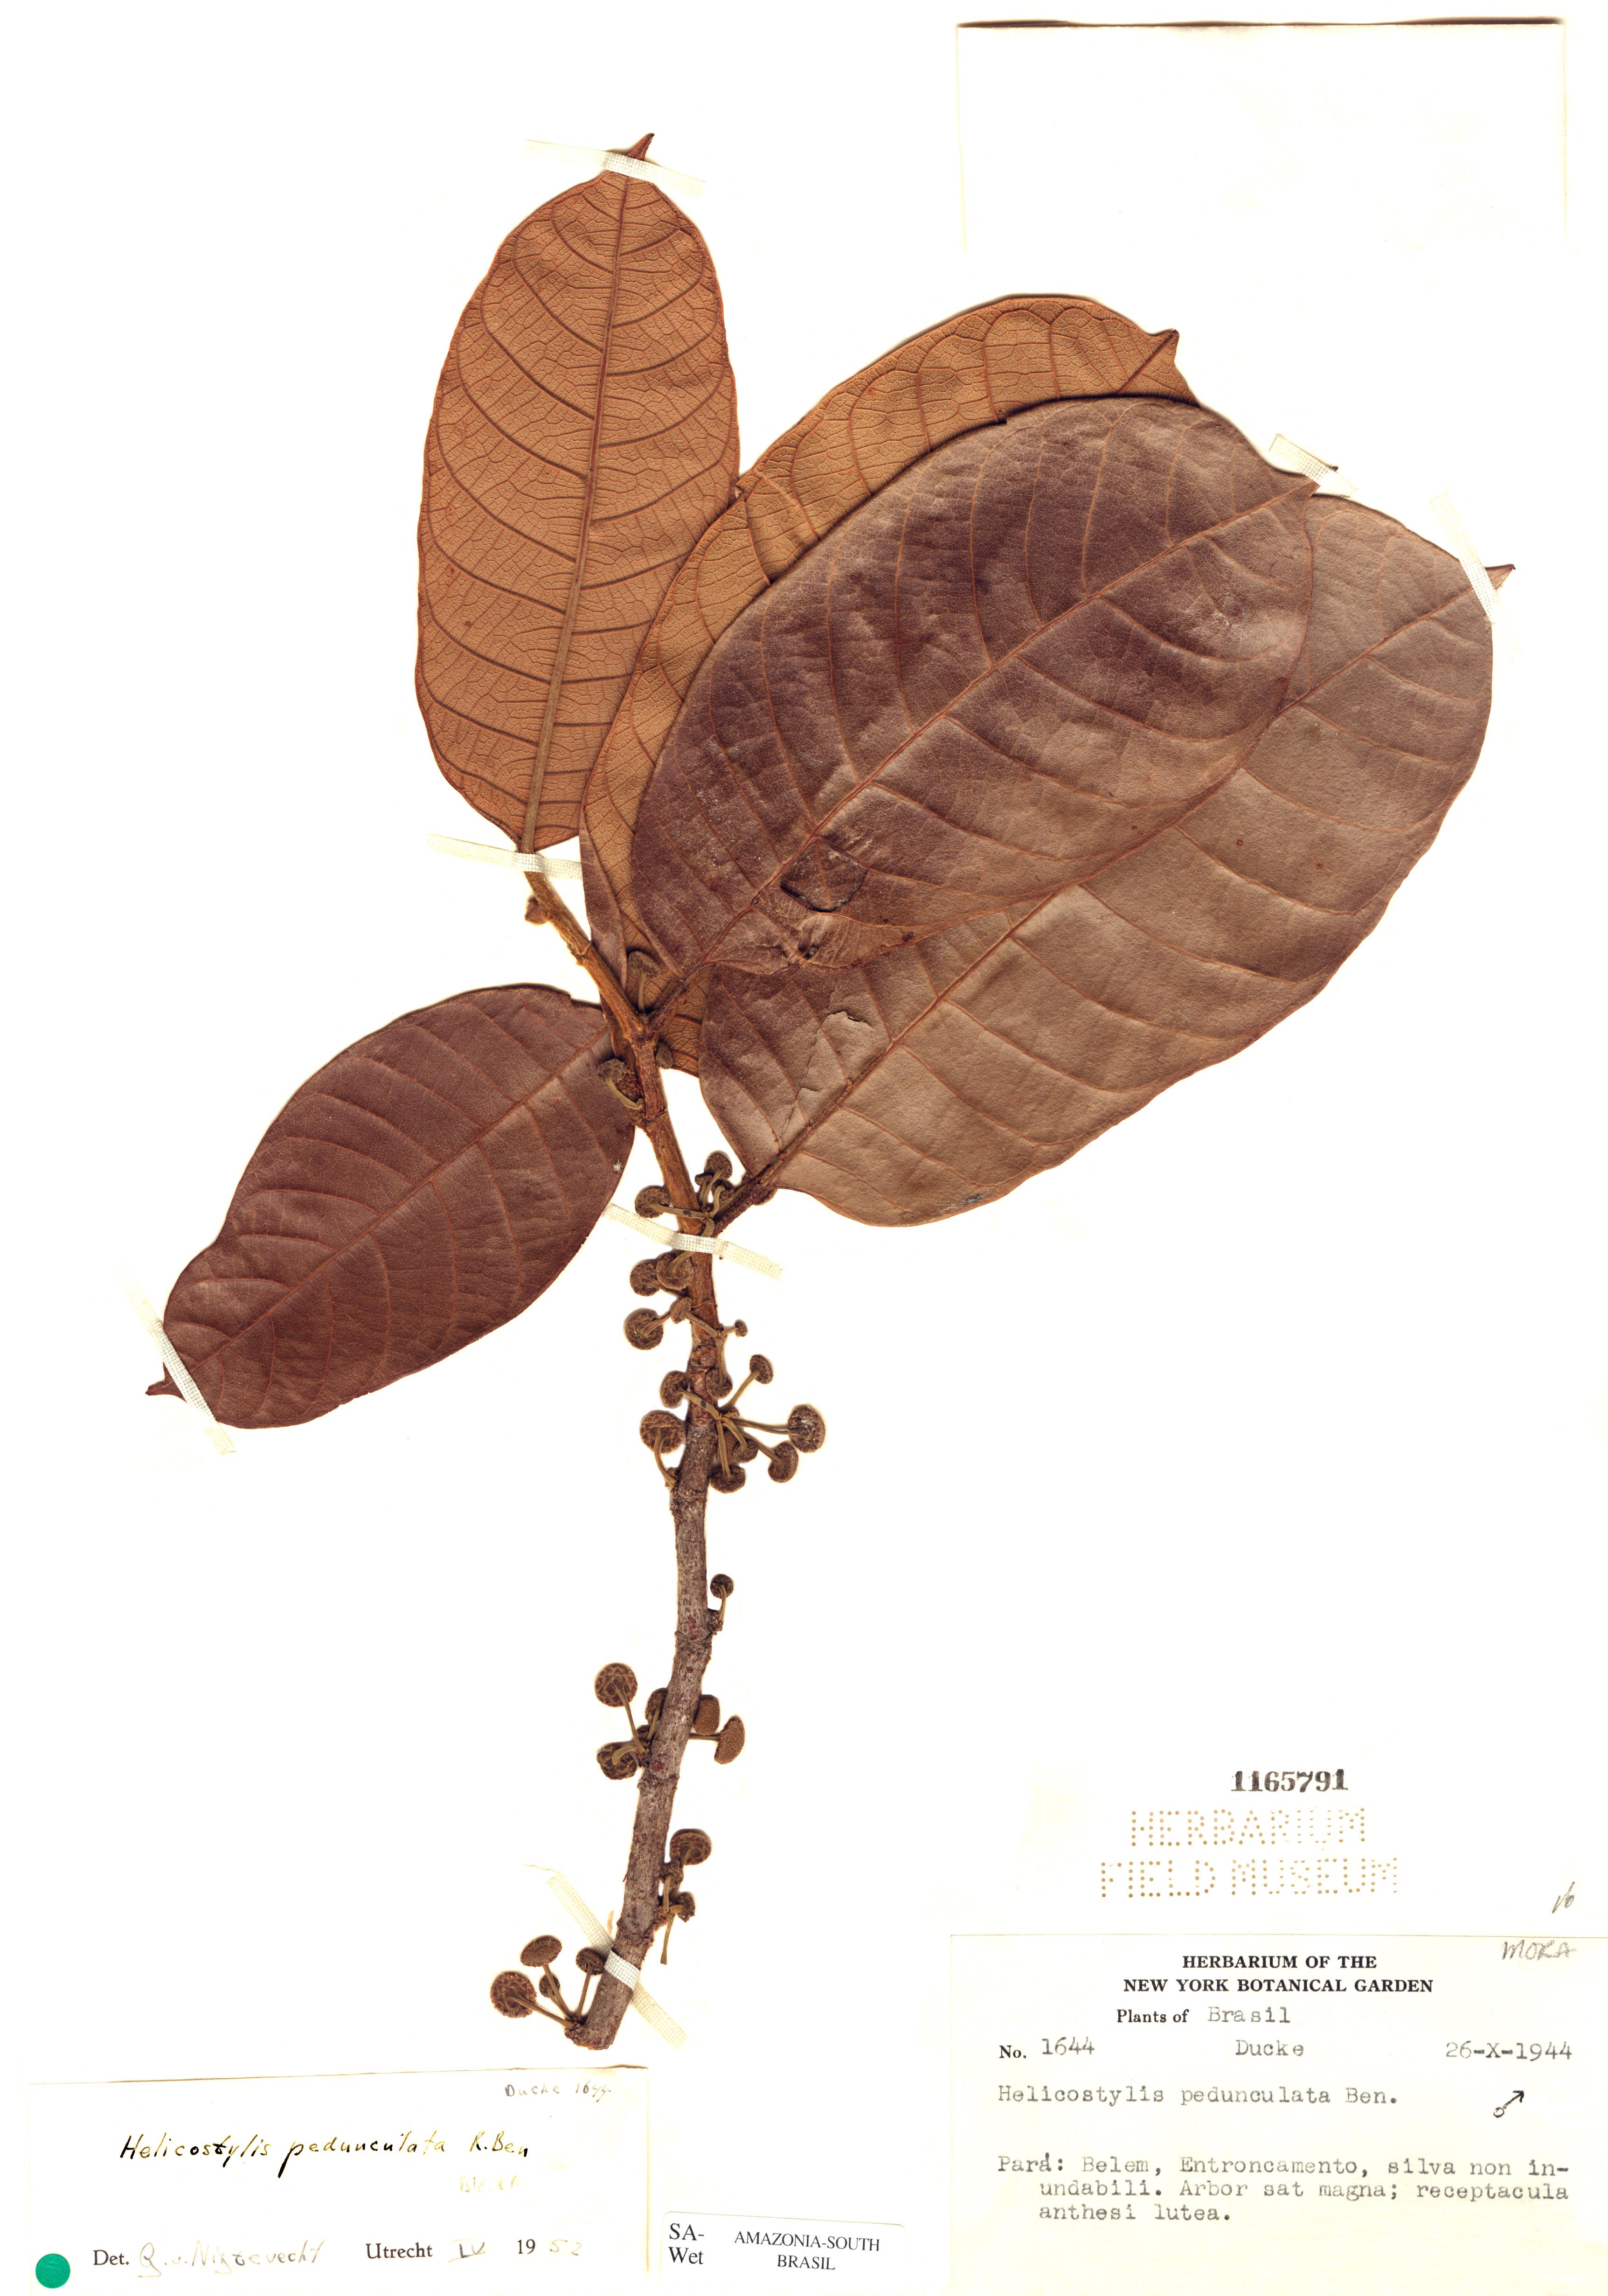 Specimen: Helicostylis pedunculata